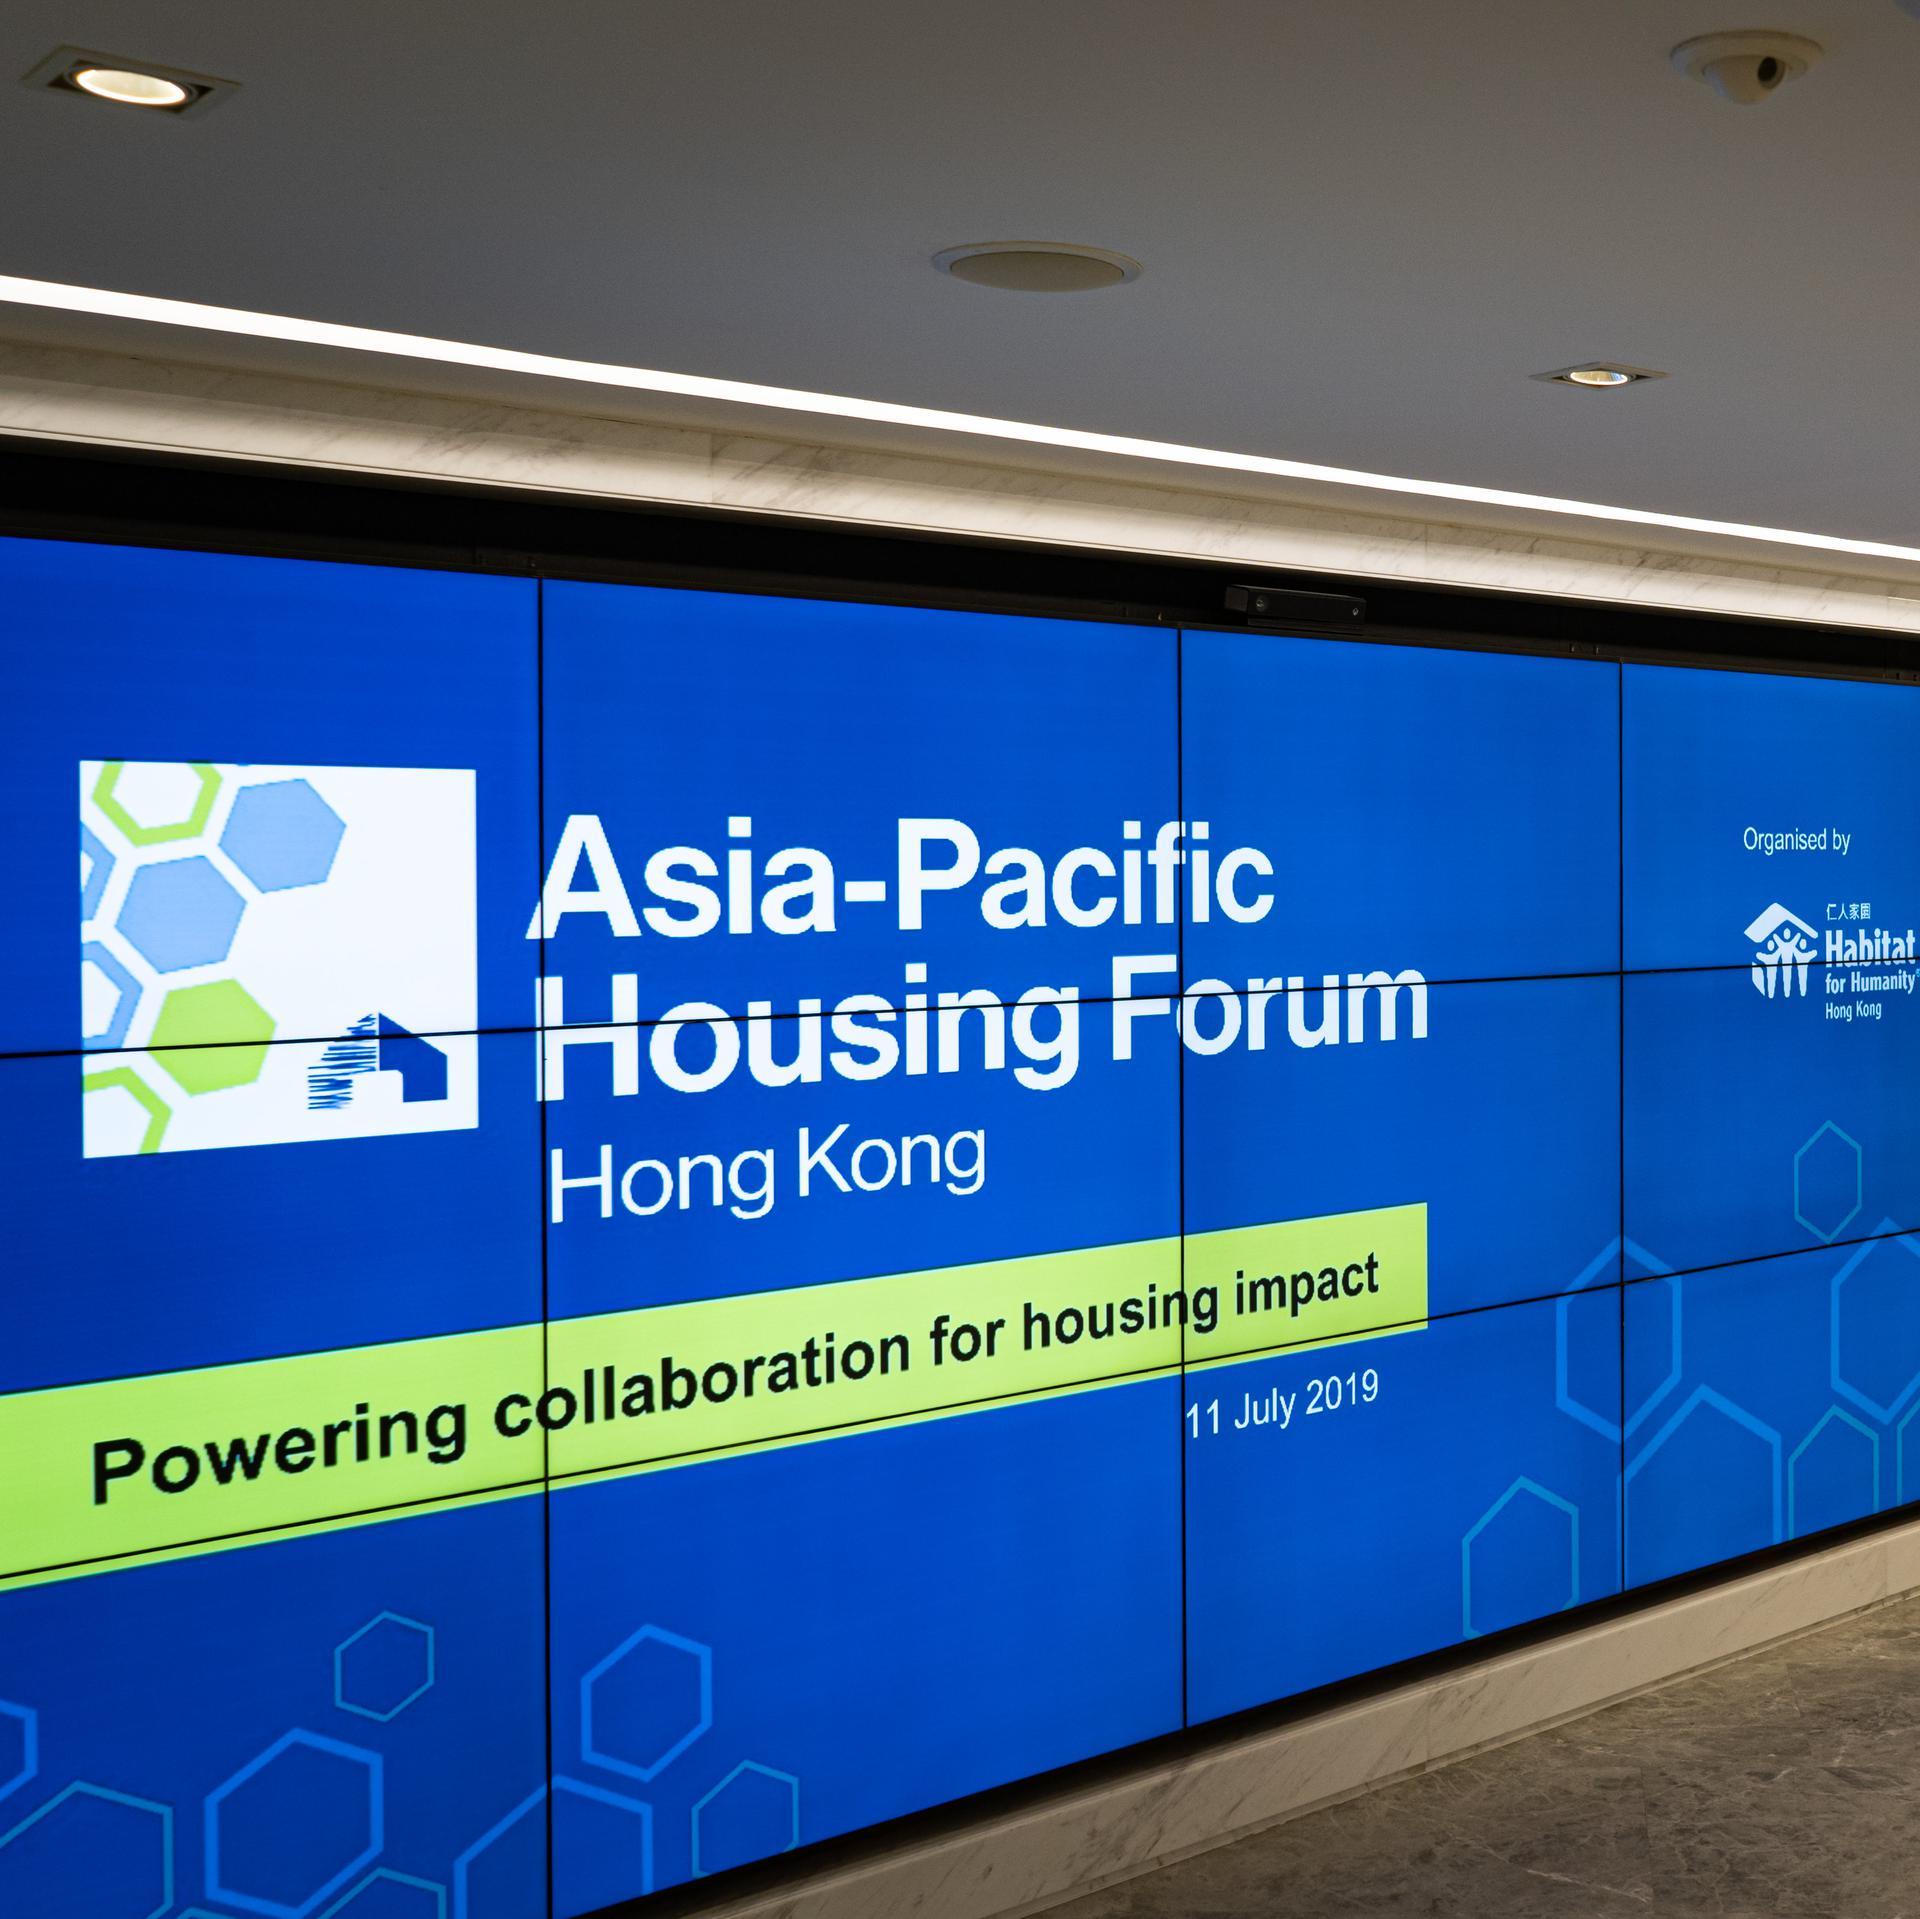 Habitat Hong Kong Housing Forumisback!